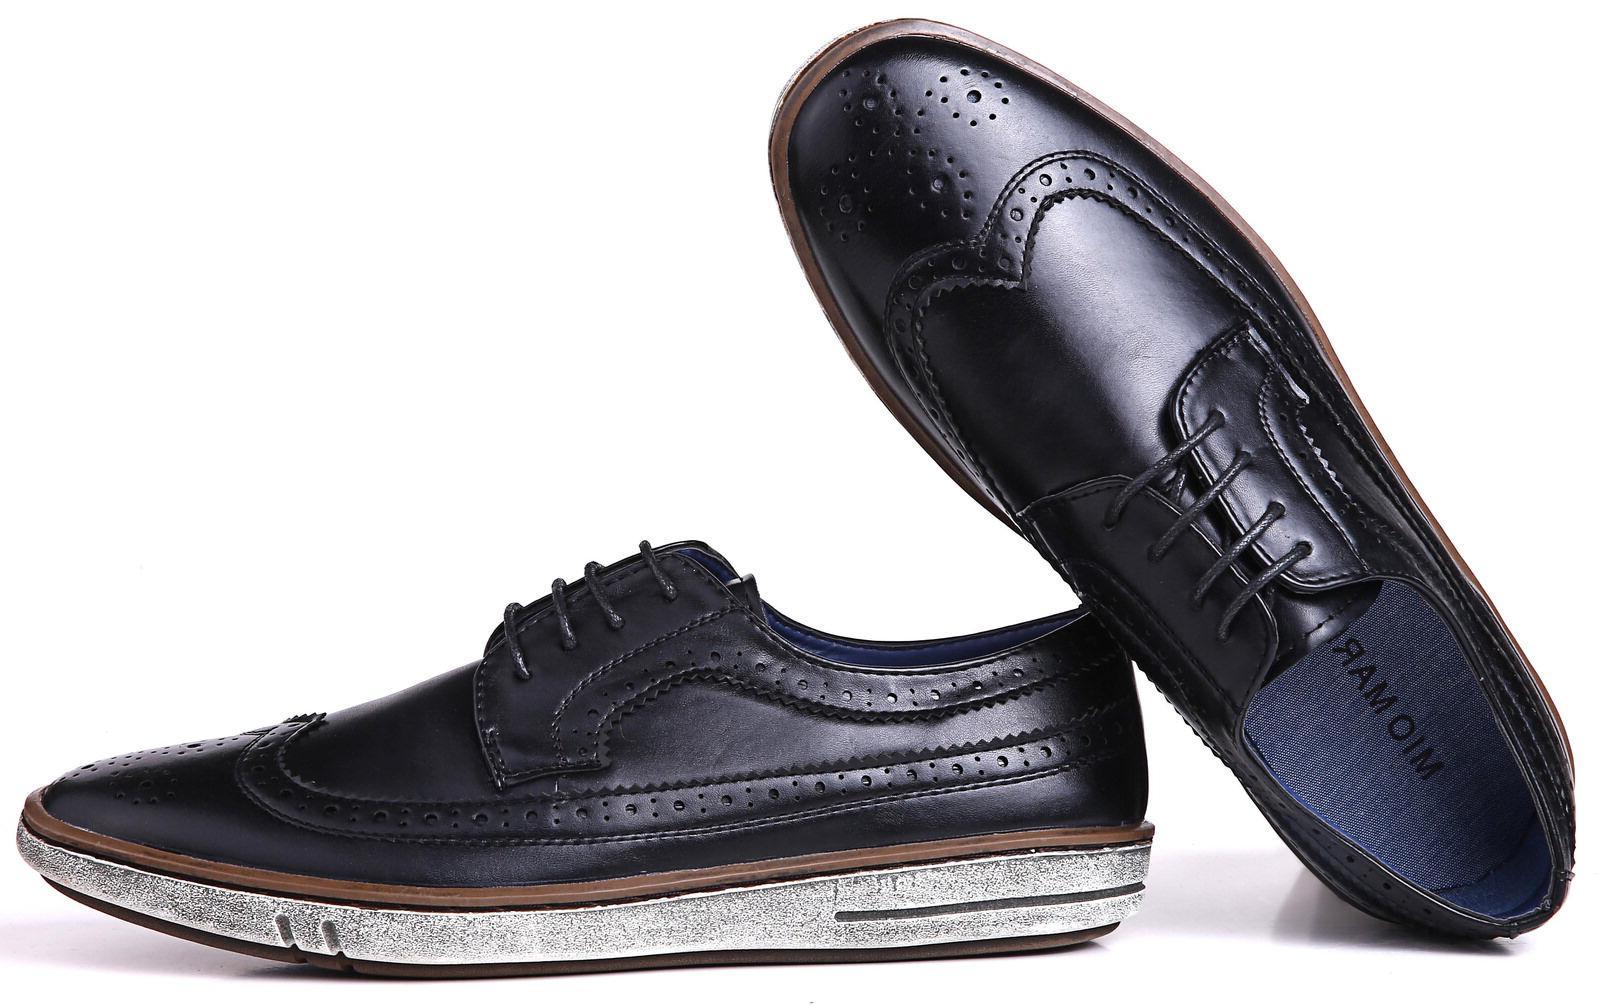 Mio Mens Shoes Fashion Oxford Men